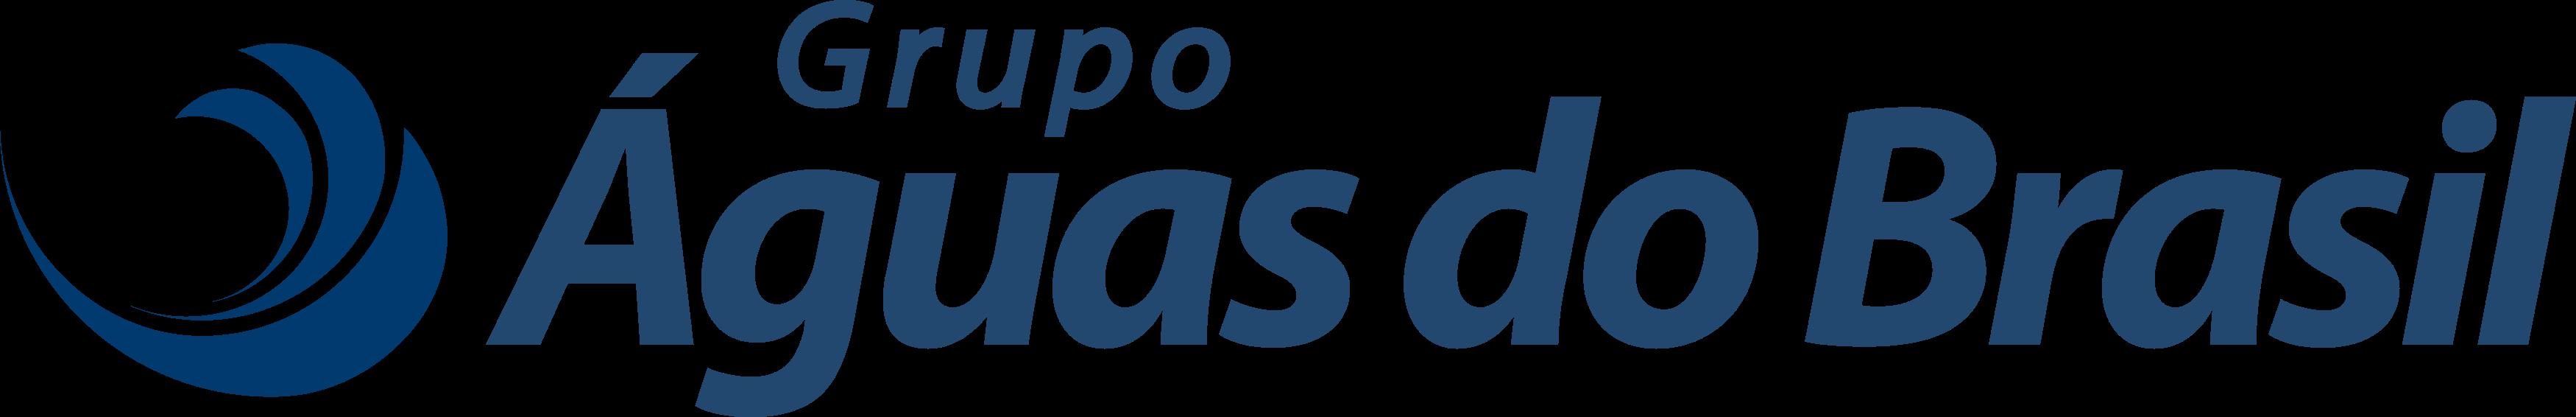 Grupo águas do Brasil Logo.